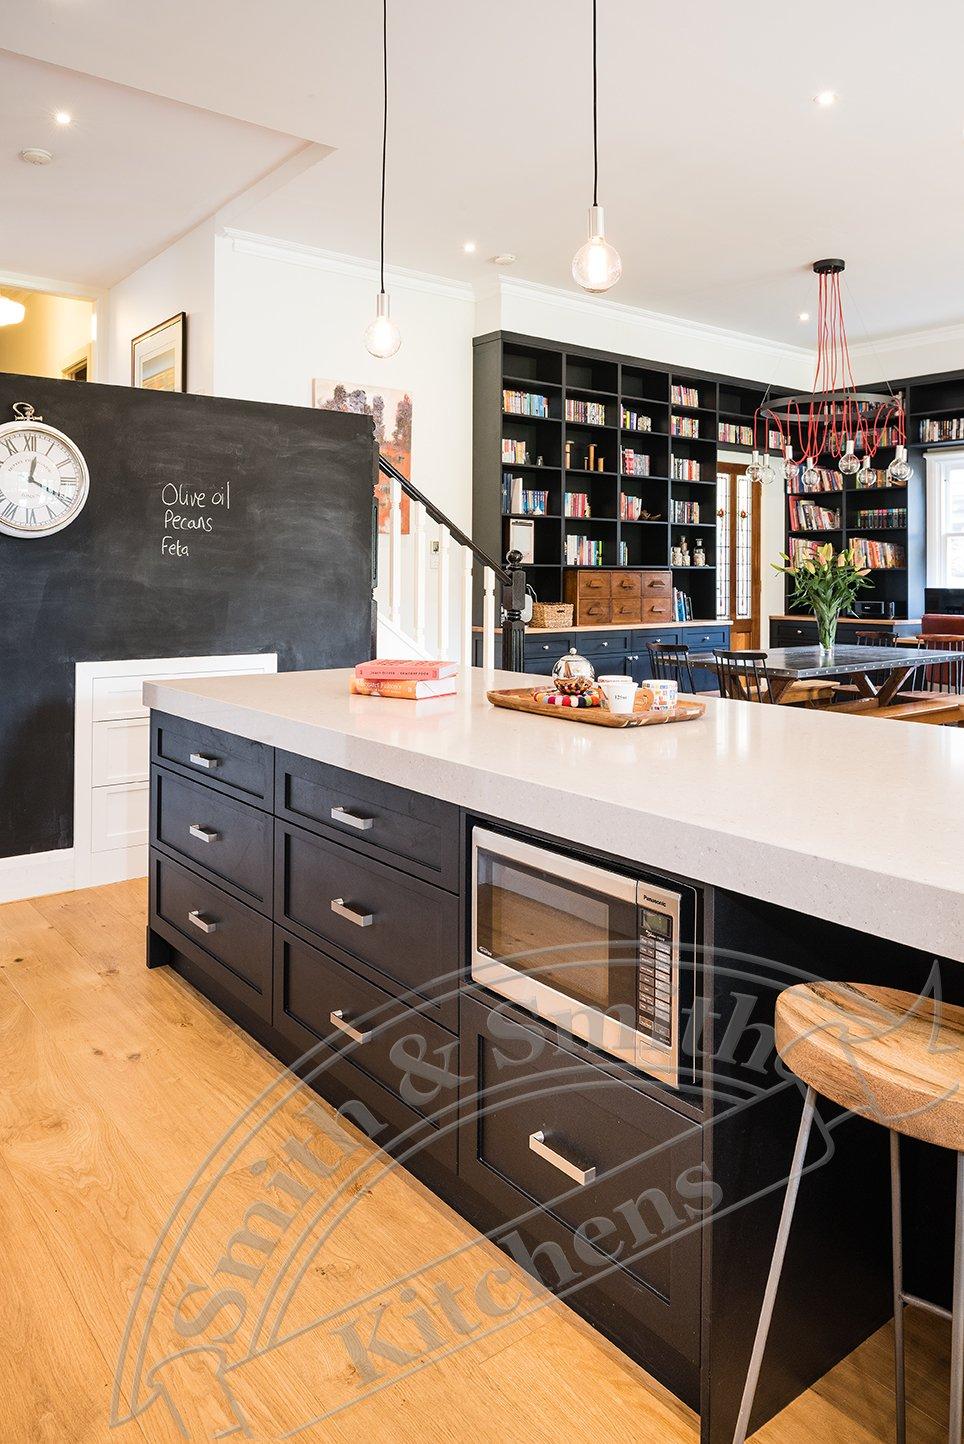 Kitchen Decor Cheap Kitchen Remodeling: Kitchen Remodel Timeline